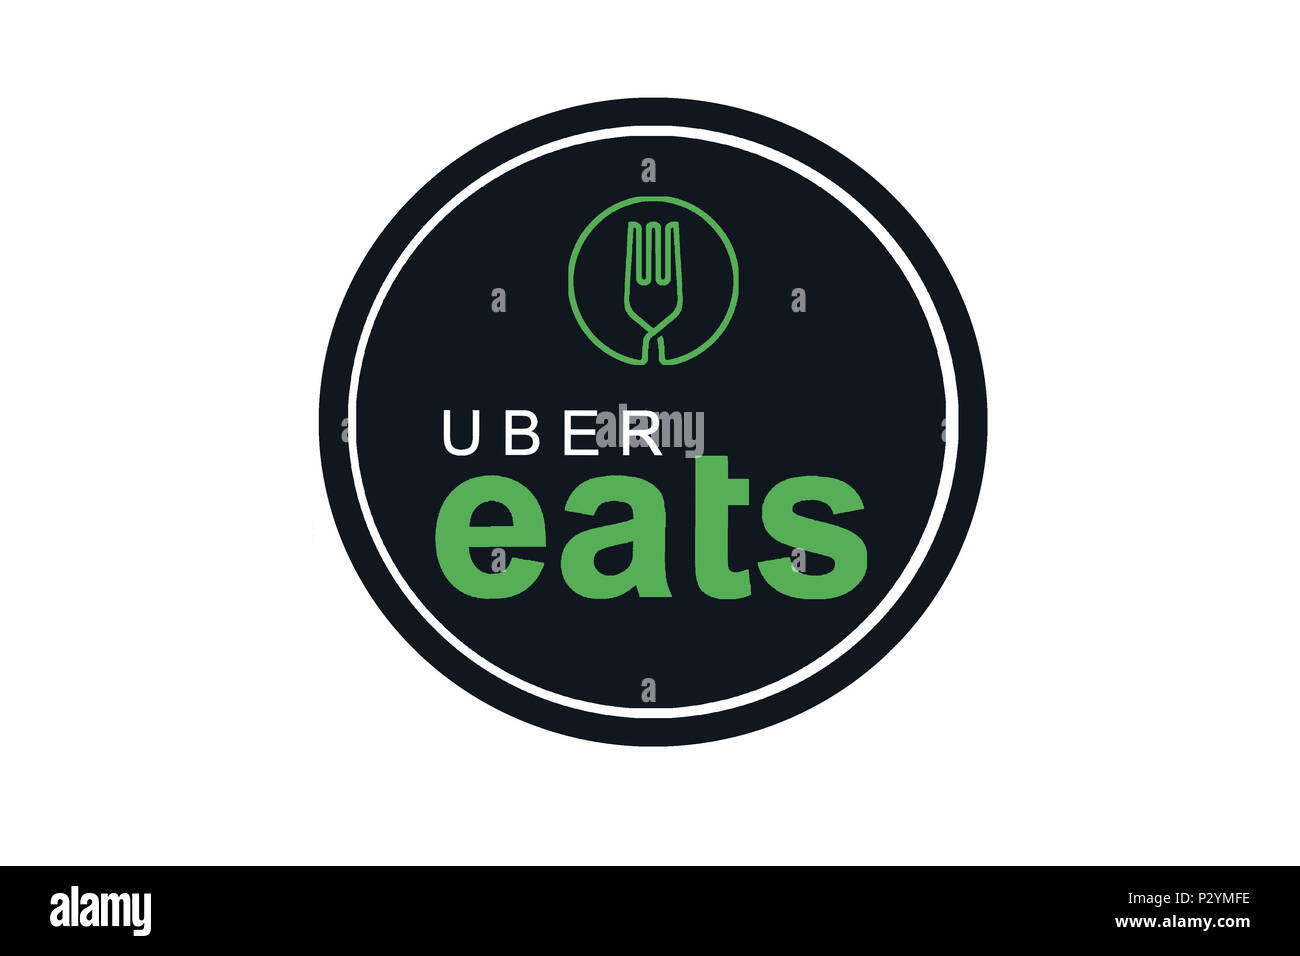 Portugal Lisbon June 16 2018 Illustration Of The Uber Eats Logo